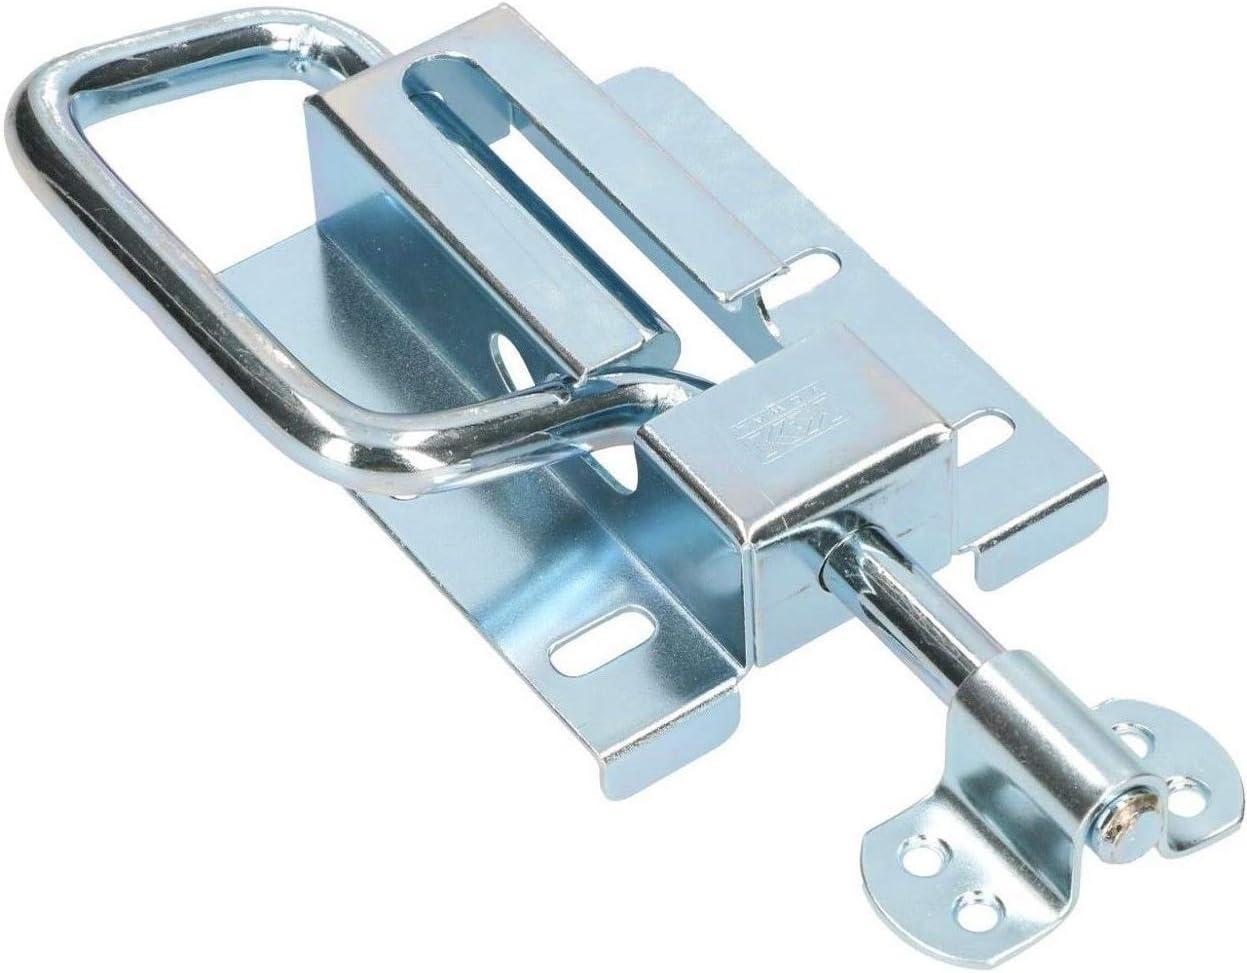 KOTARBAU® - Pestillo de puerta 120/12 mm, puerta de resorte, cerrojo de puerta, puerta corredera de puerta, galvanizado en plata